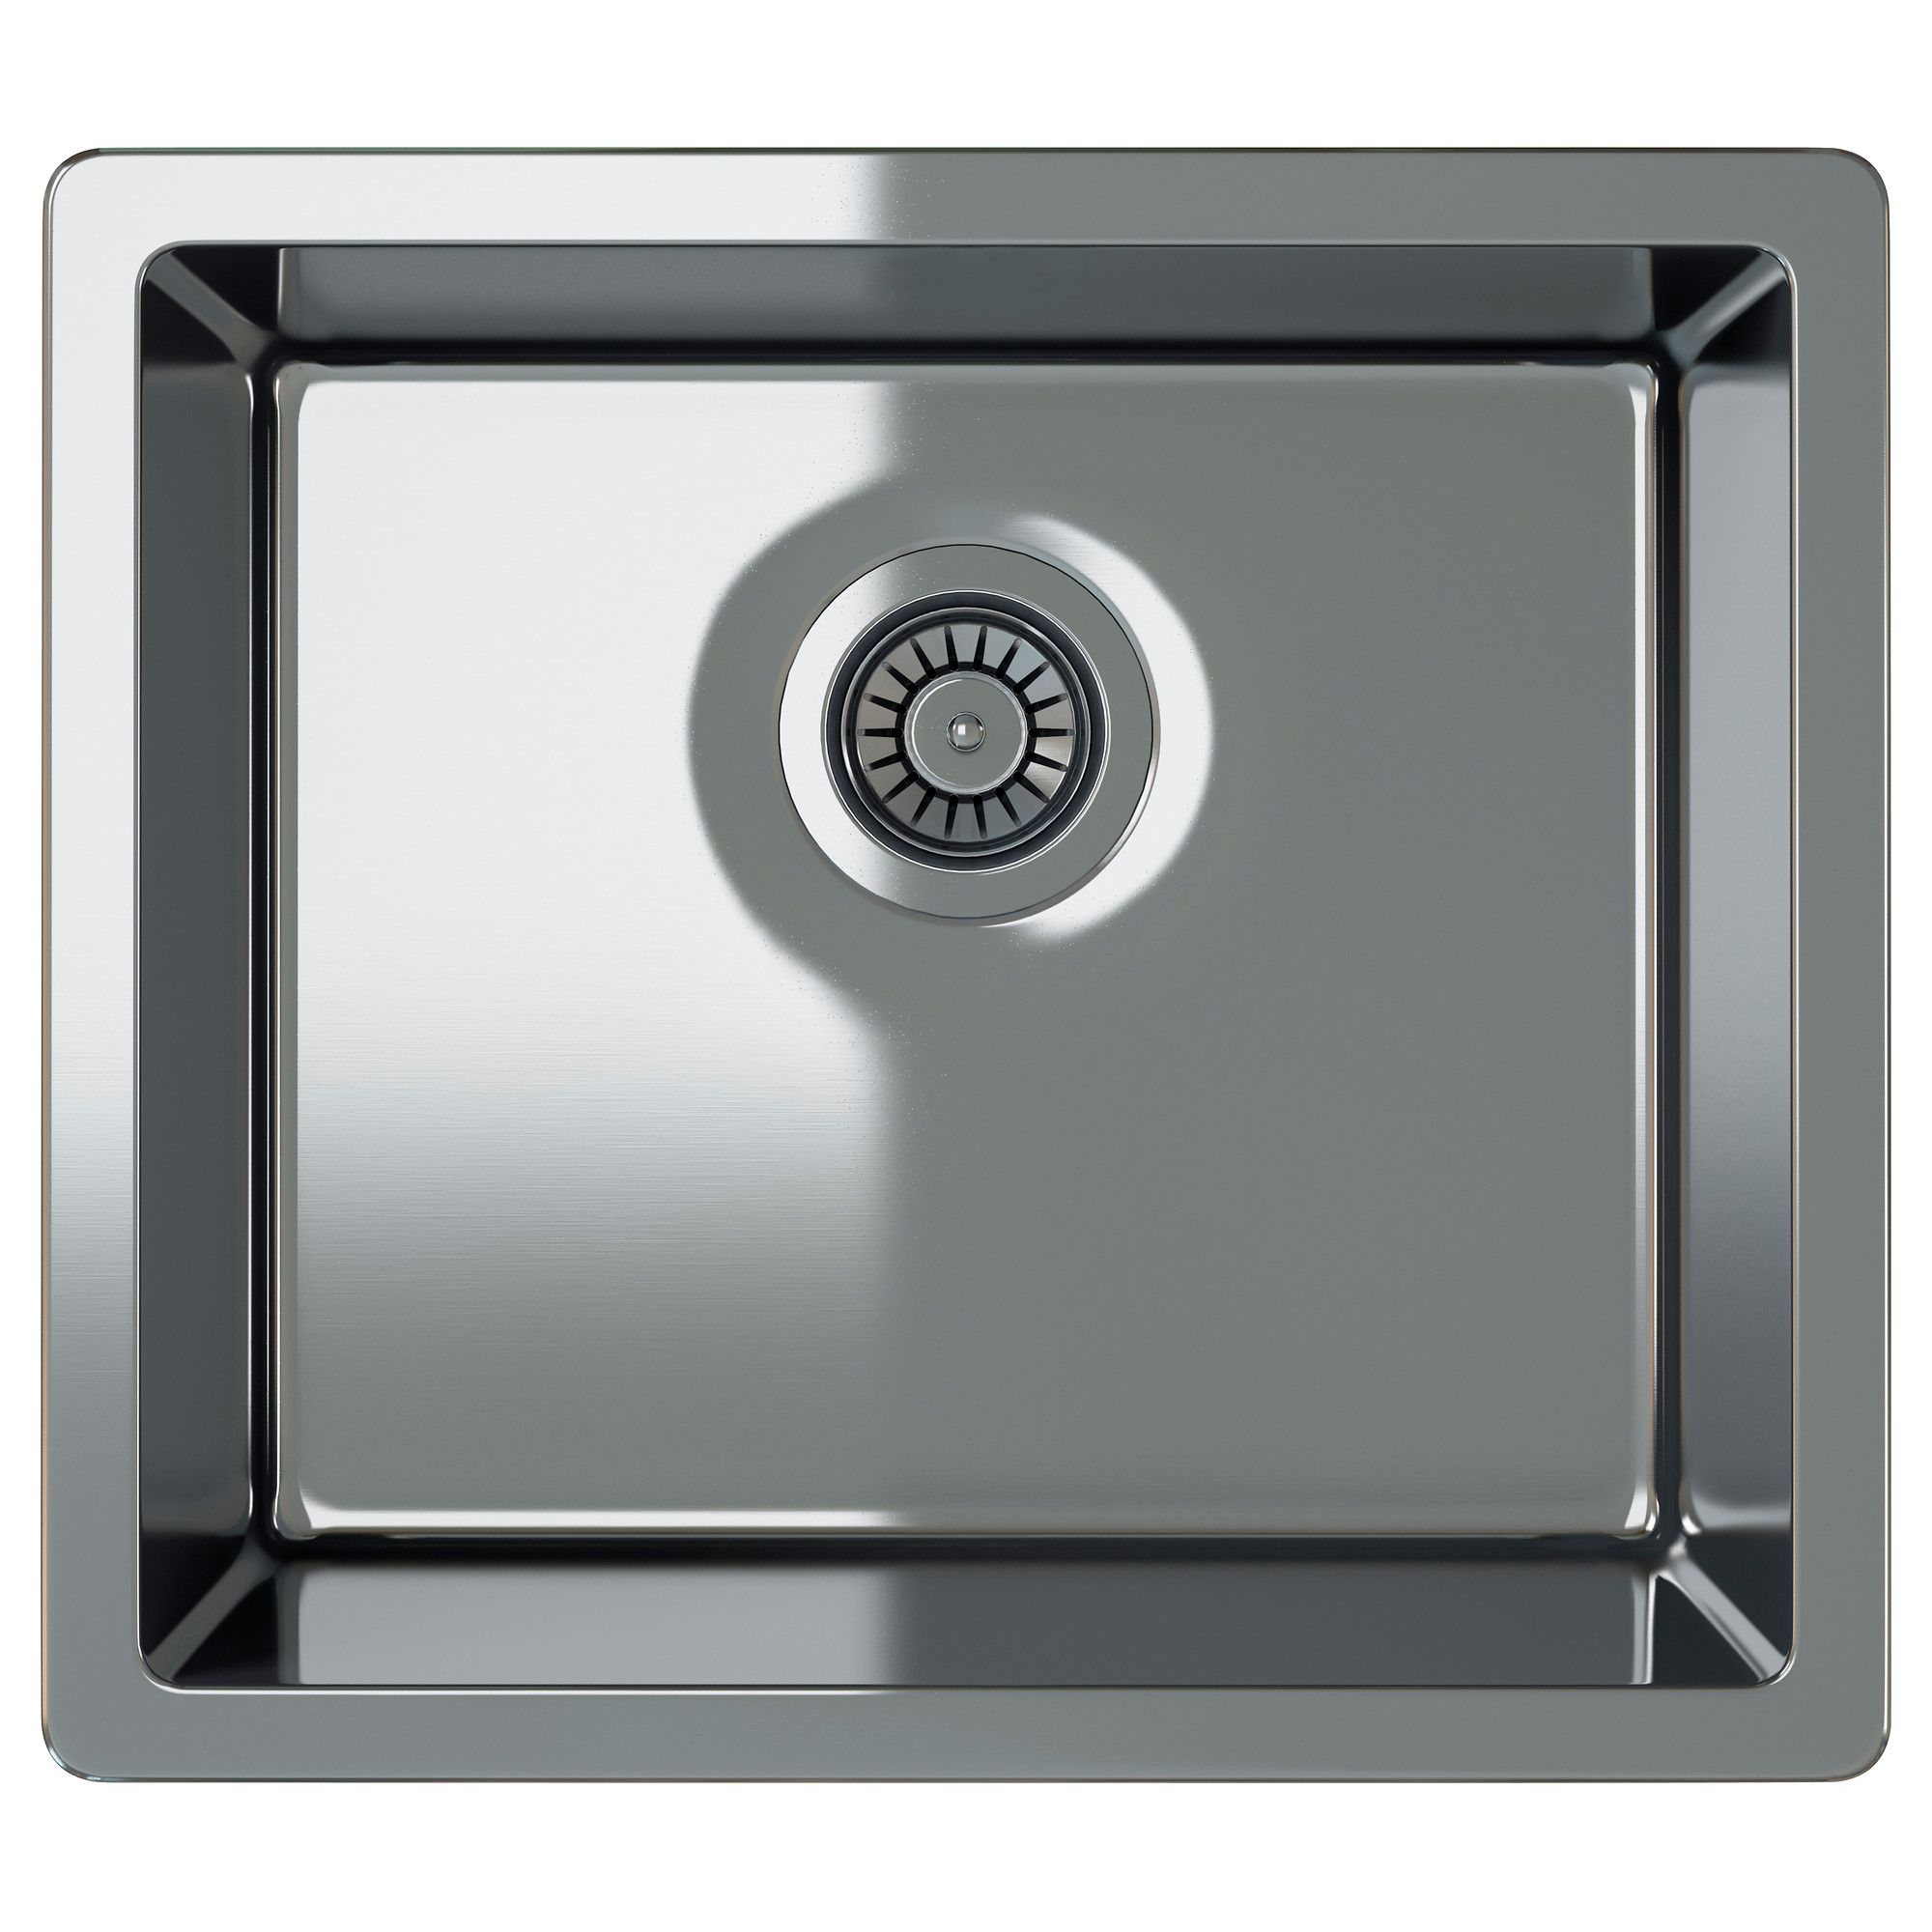 High Quality BREDSKÄR Single Bowl Inset Sink, Stainless Steel IKEA FAMILY Regular Price  $255.99